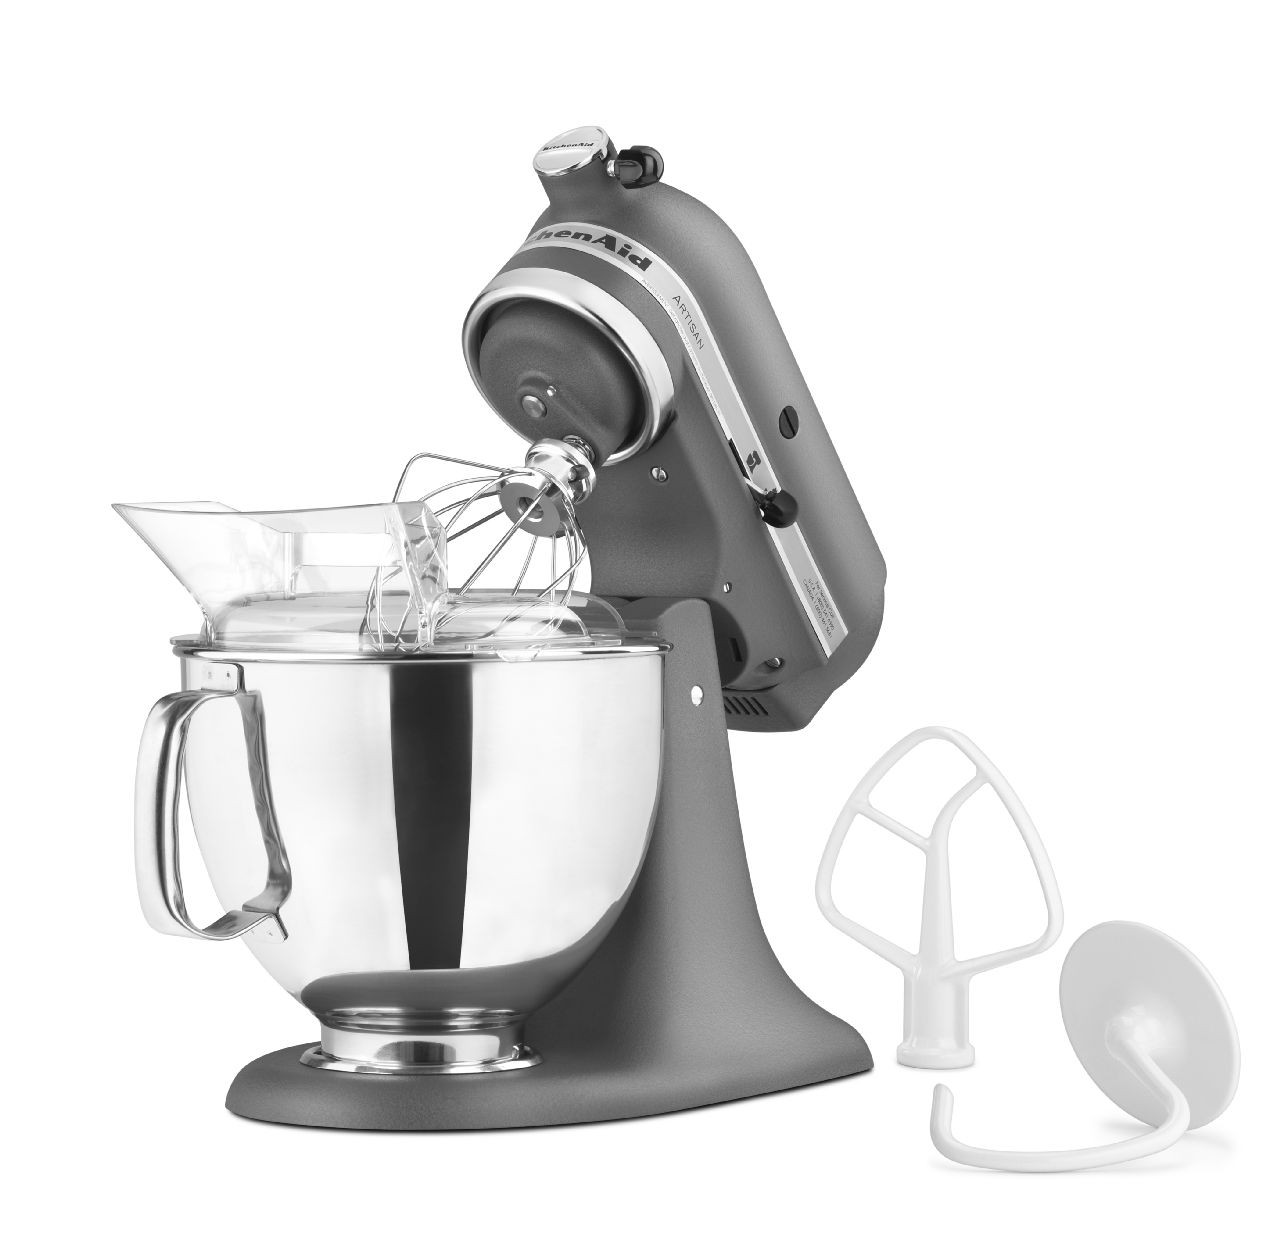 KitchenAid-Artisan-Series-5-Quart-Tilt-Head-Stand-Mixer-10-Speeds-KSM150PS thumbnail 64